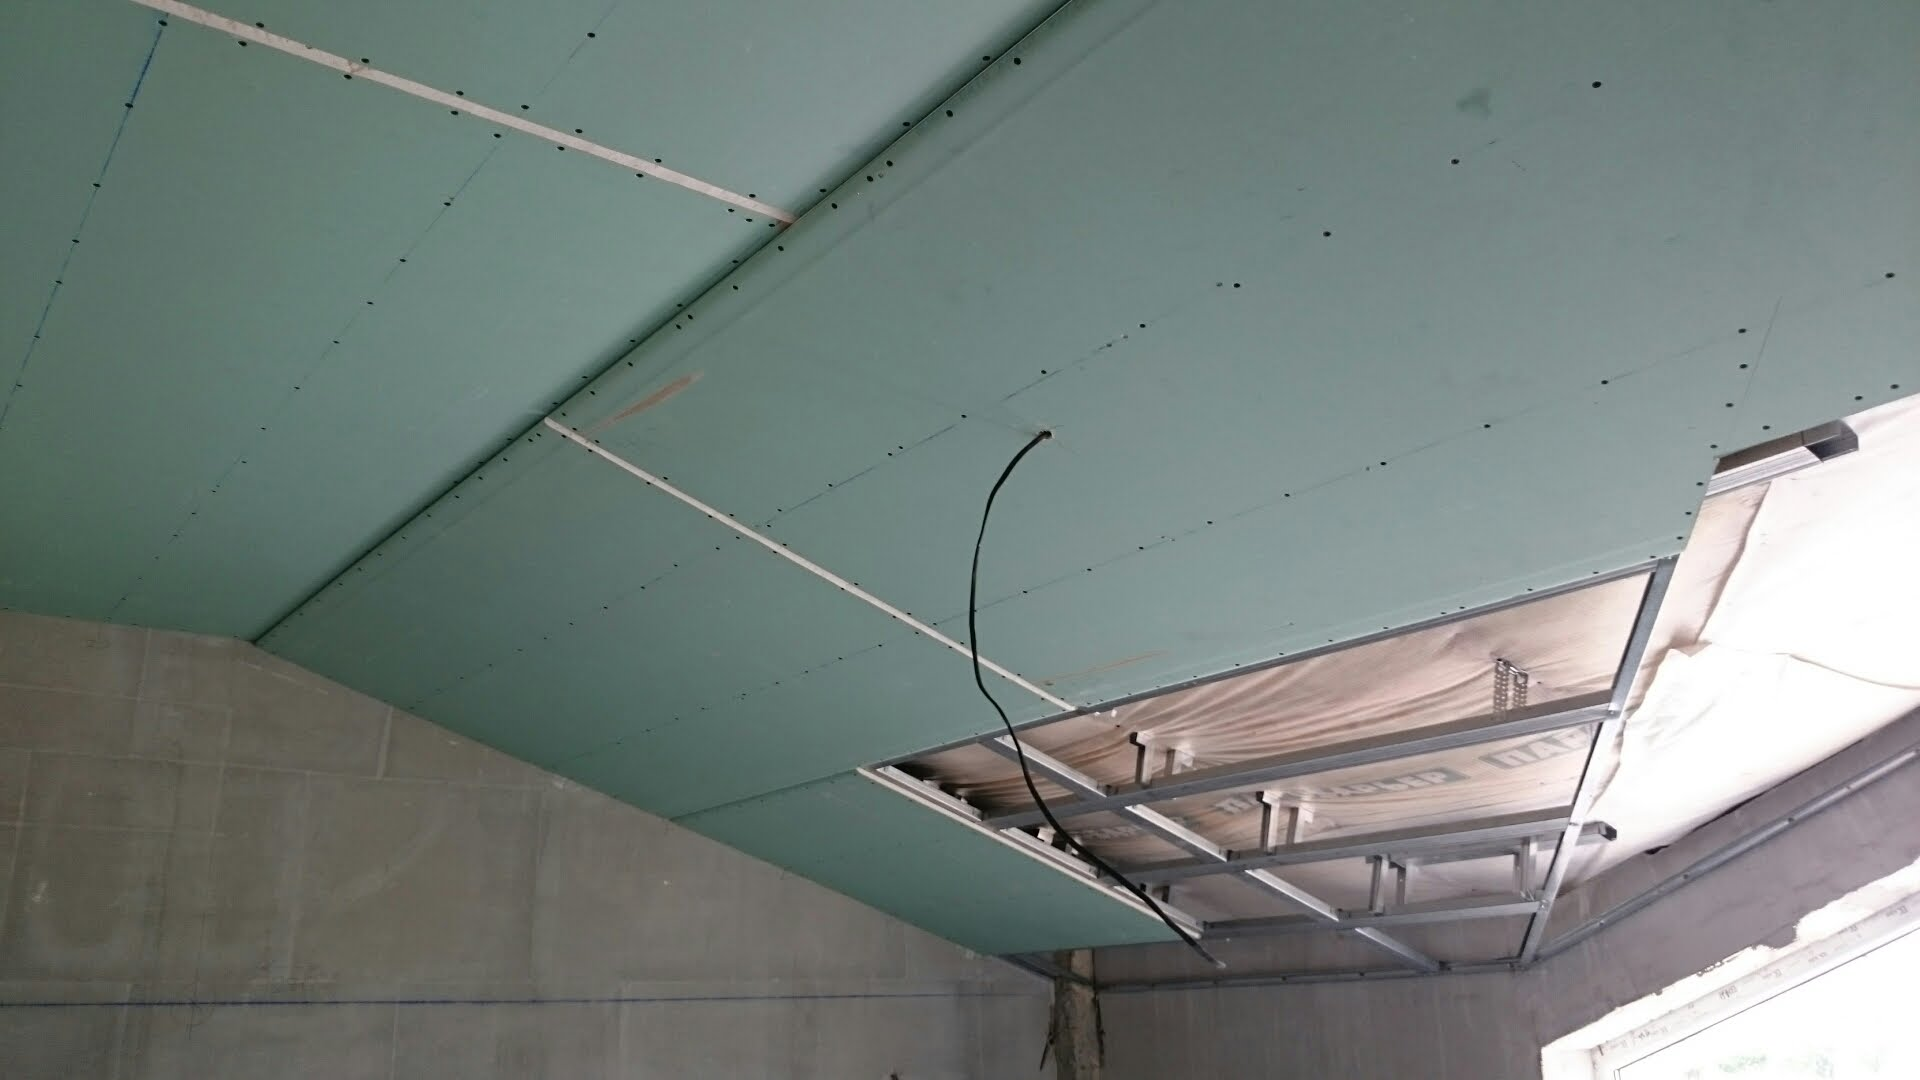 монтаж подвесного потолка из гкл фото шкаф имеет